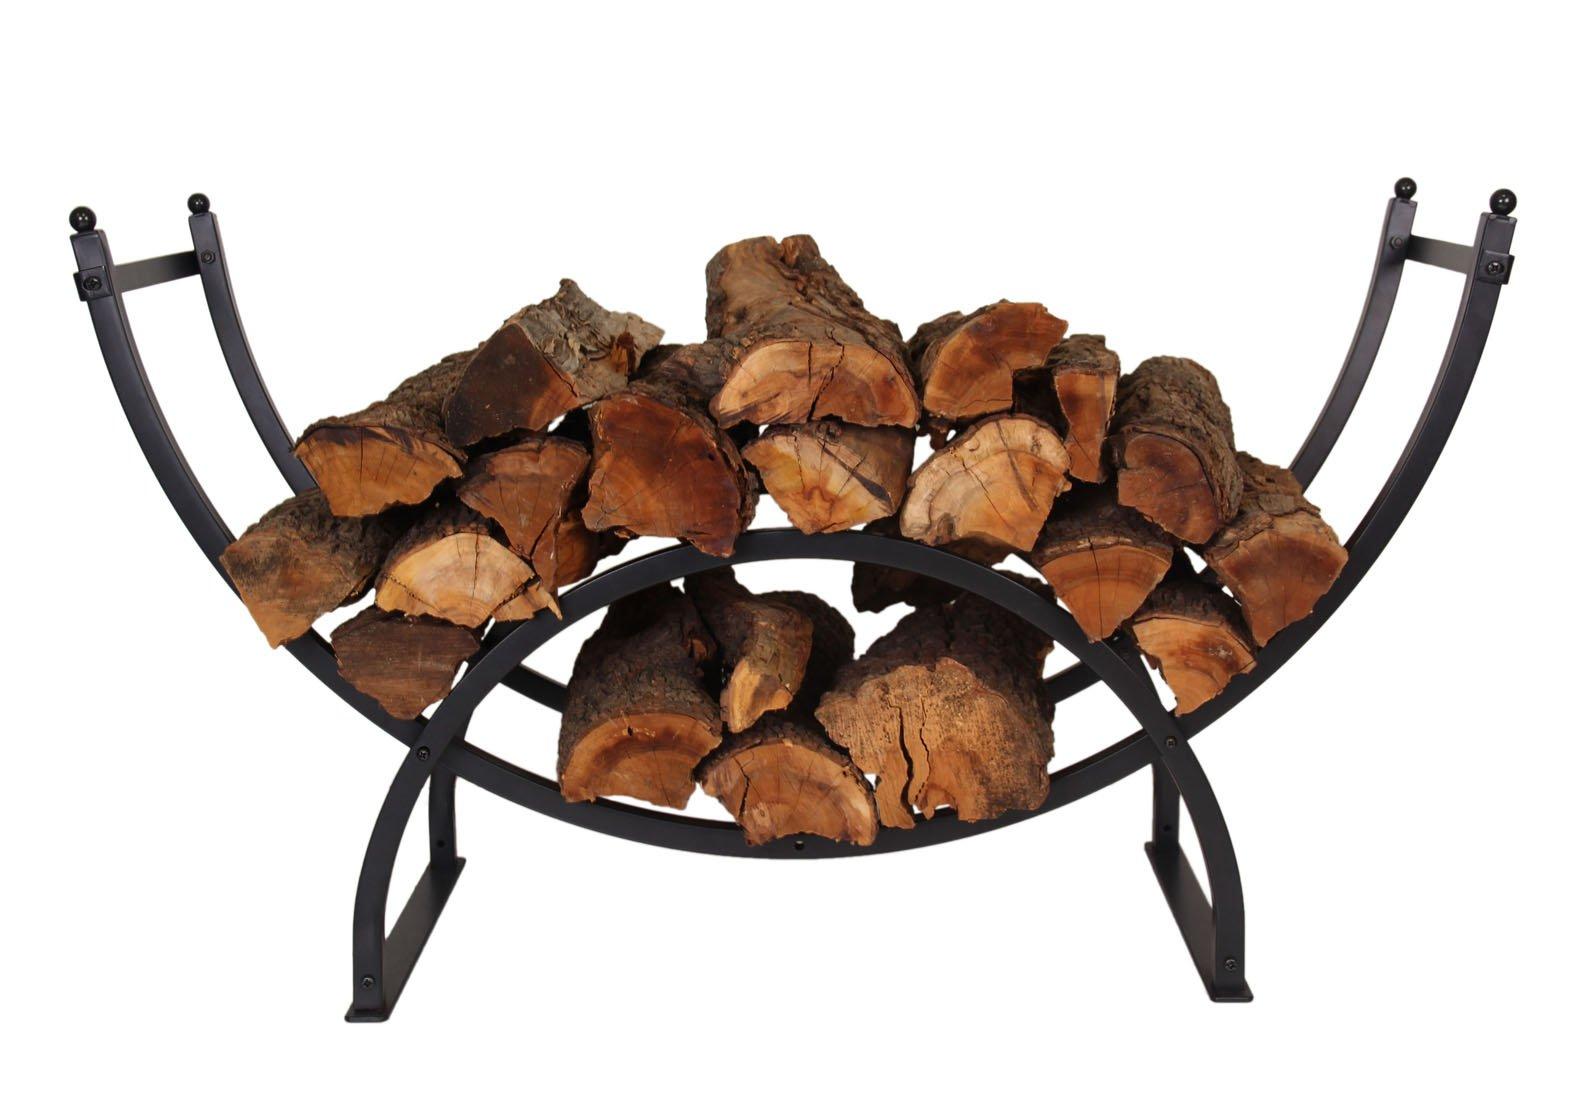 Patio Watcher 3-Foot Curved Firewood Rack Log Rack Firewood Storage Log Holder Indoor Outdoor Backyard Fireplace, Heavy Duty Steel Black